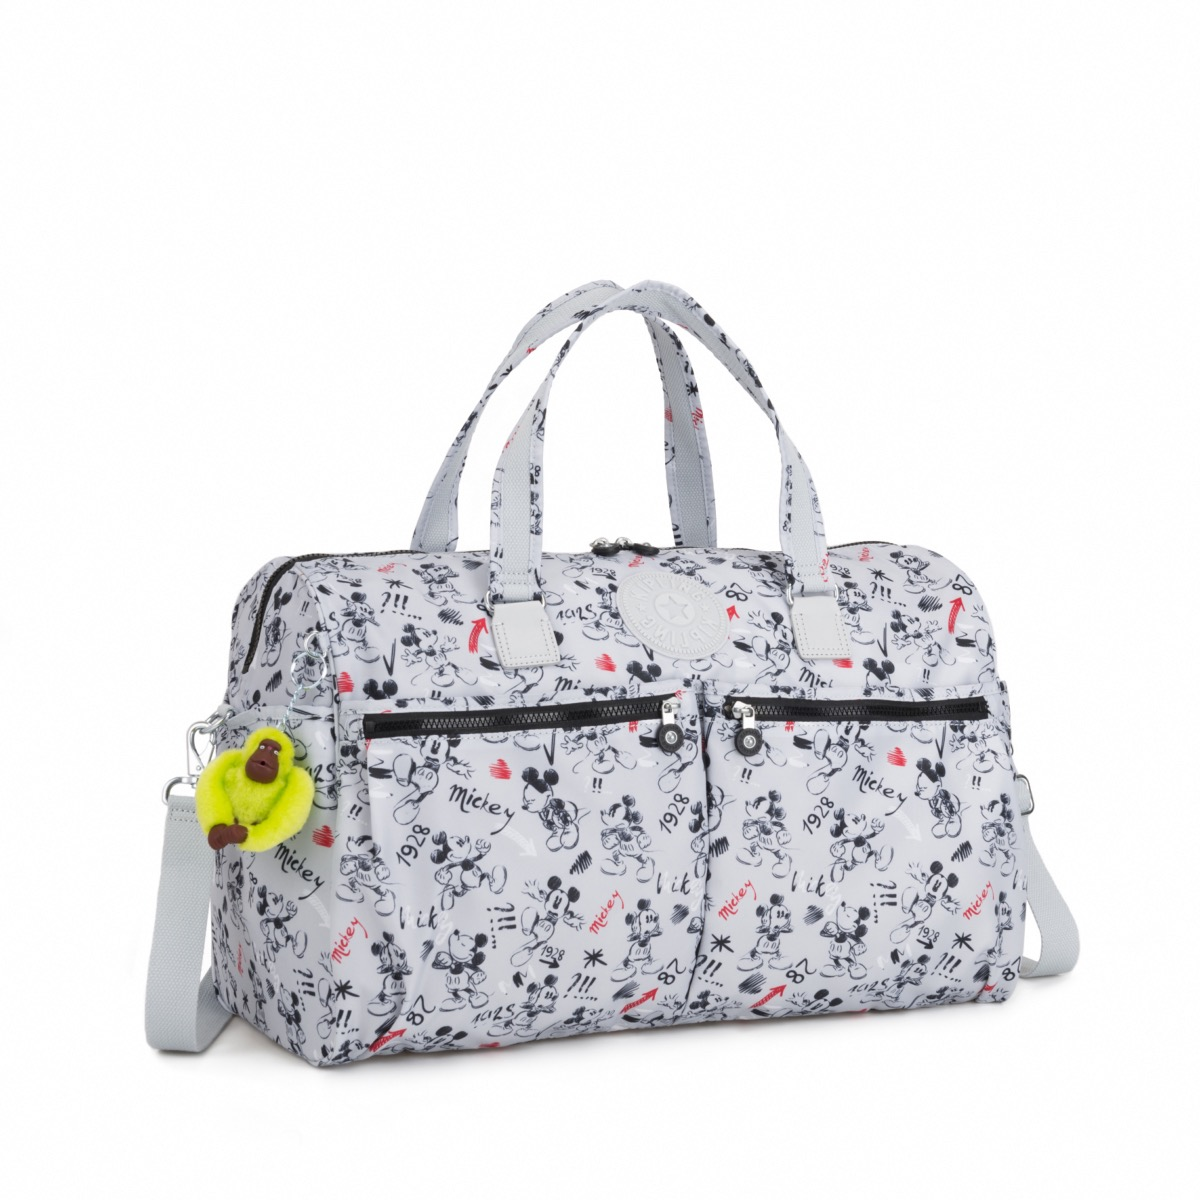 efe3faefe916 Kipling Disney D Itska Large Duffel Bag with Monkey Sketch Grey